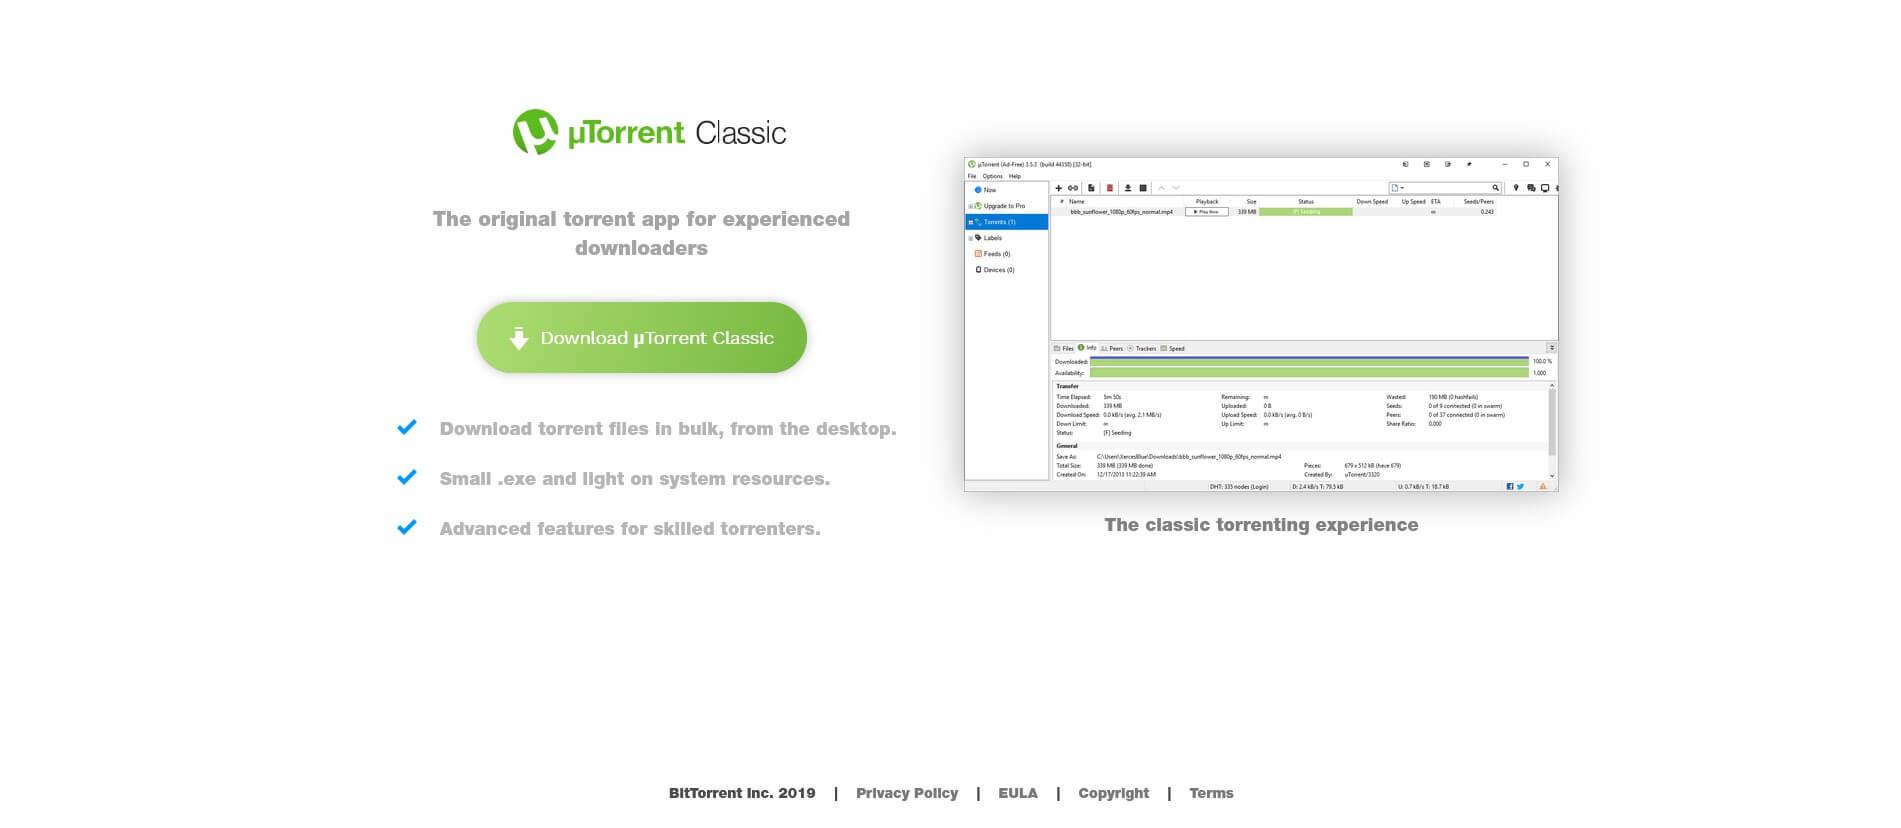 utorrent download page image